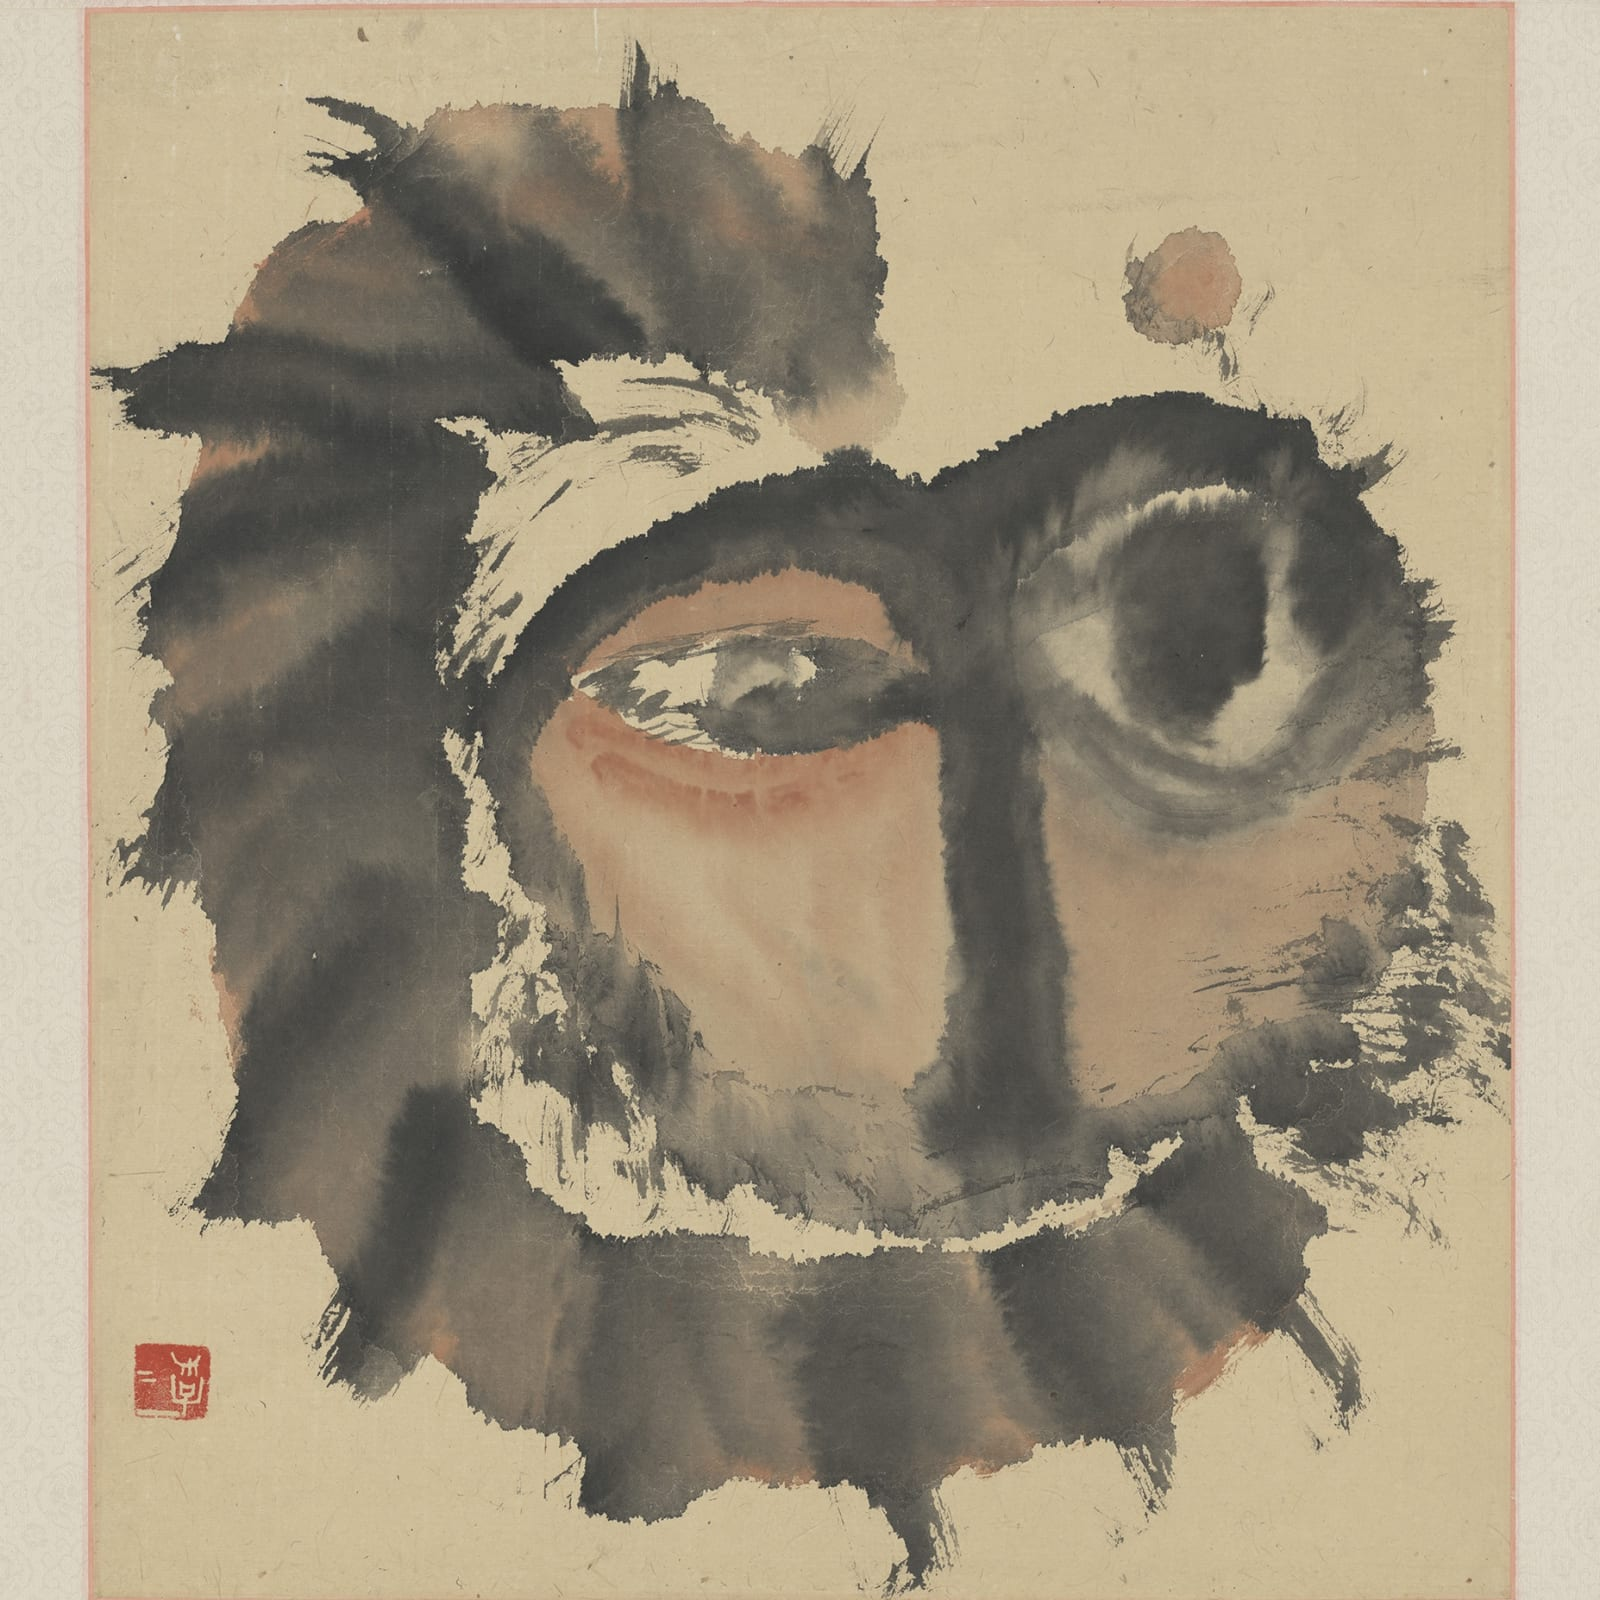 Li Jin 李津, The Tibet Series XIII 西藏组画之十三, 1984